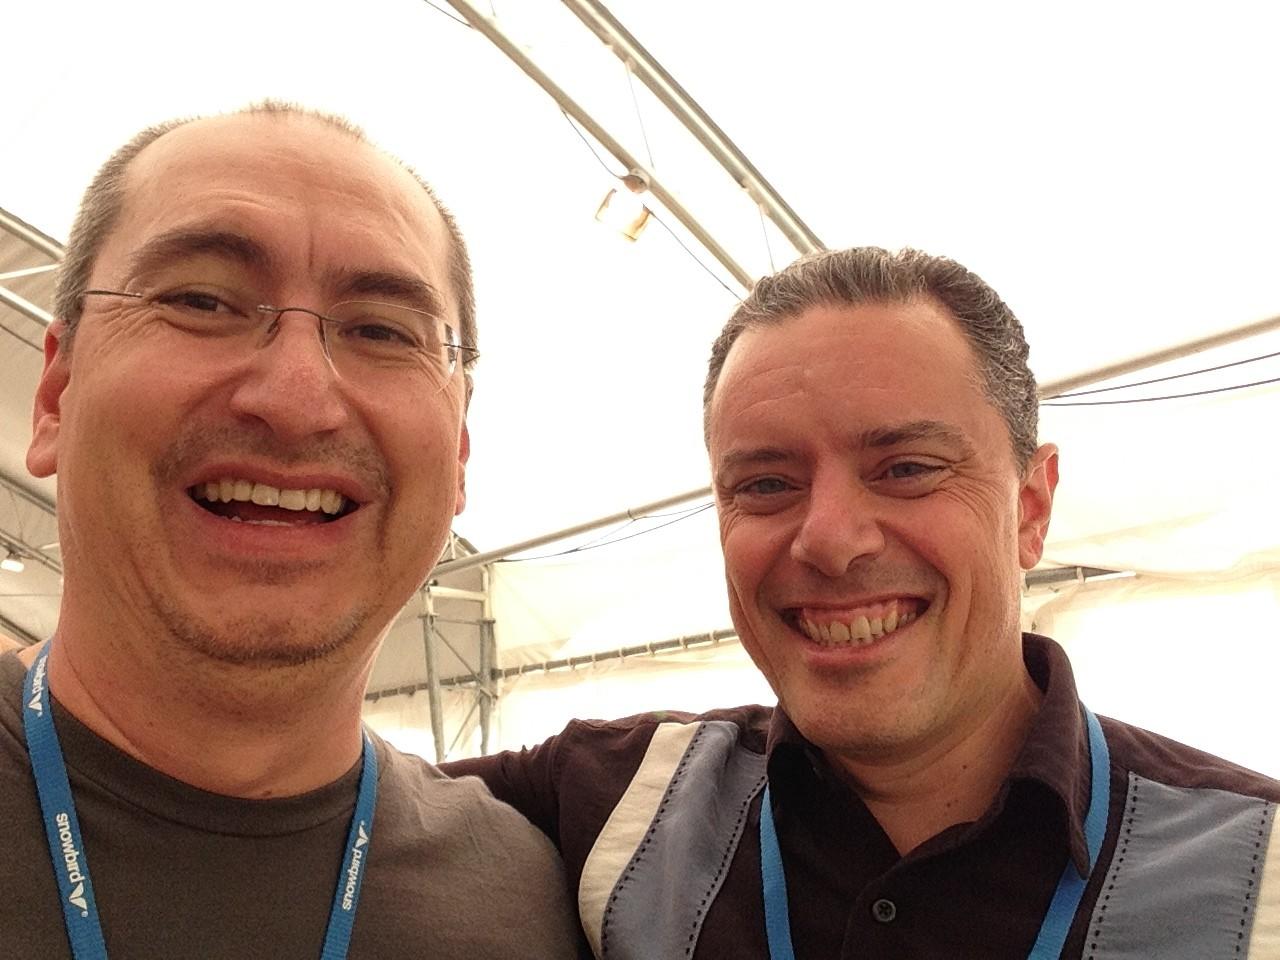 DiGRA 2014 selfie with Michael Mateas